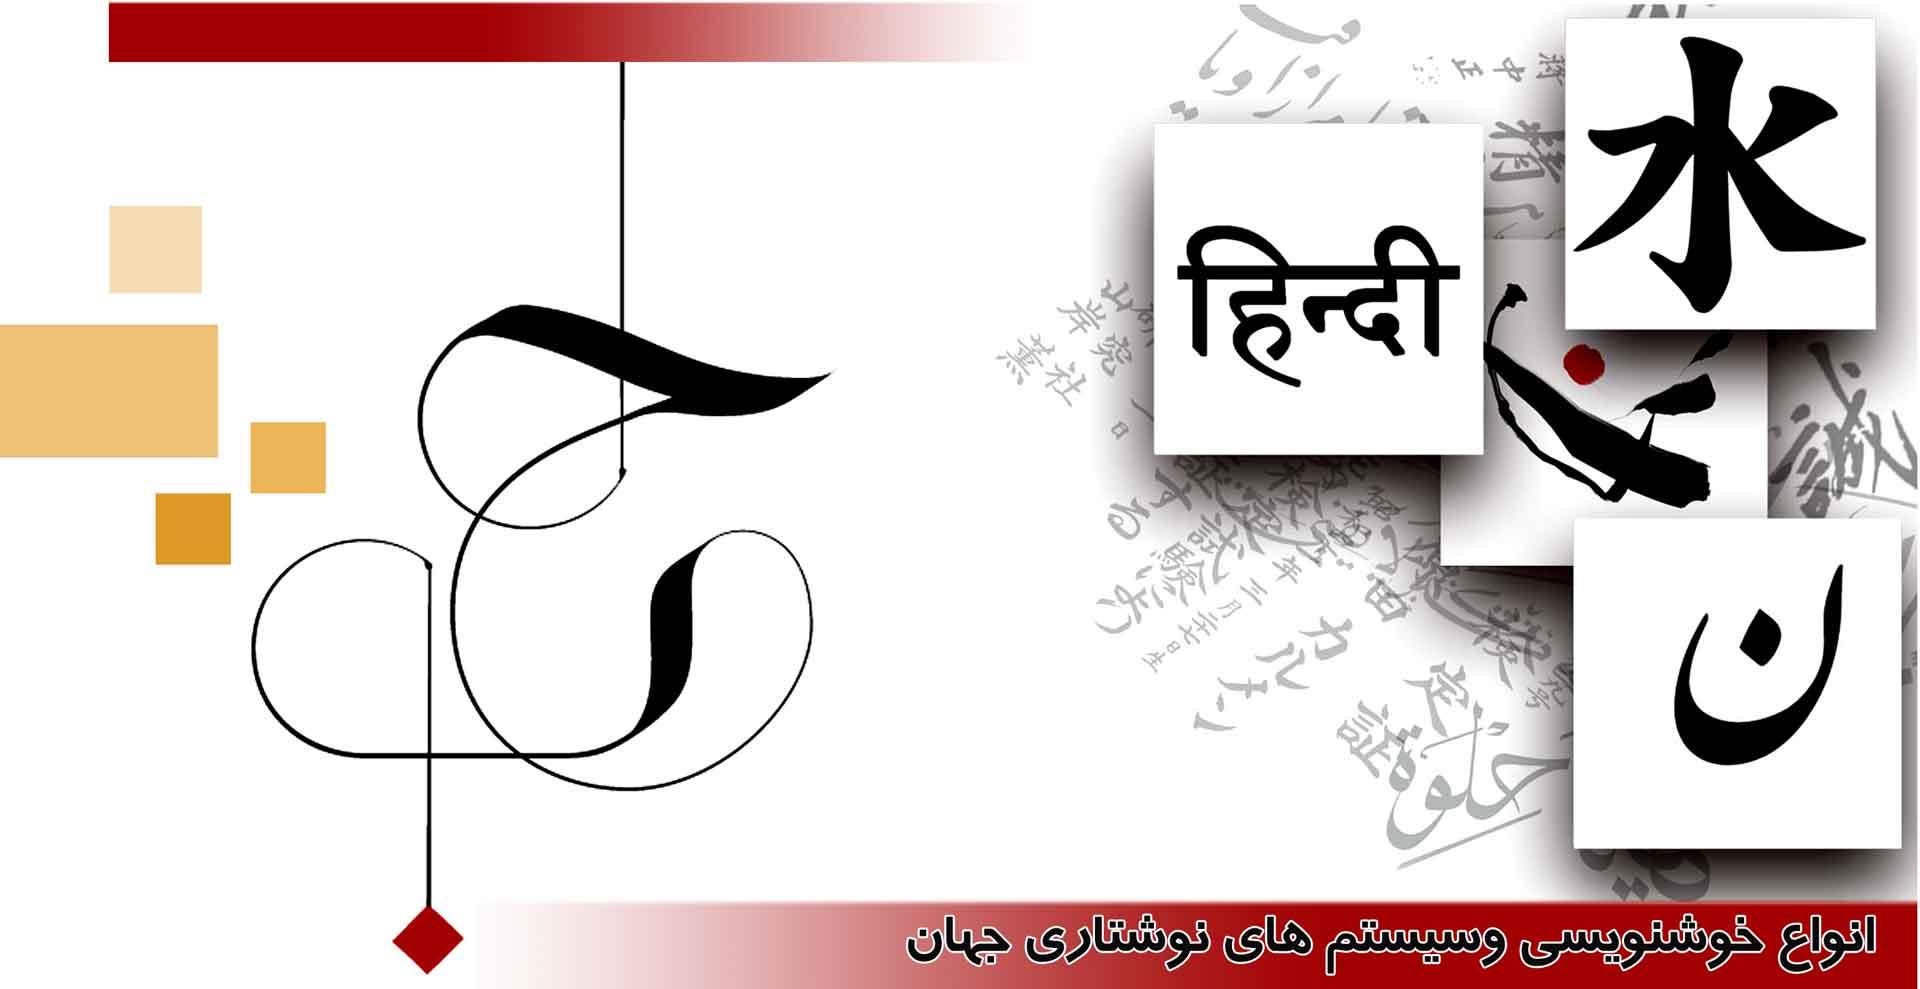 khoshnevisi sarba - انواع خوشنویسی و سیستم های نوشتاری جهان